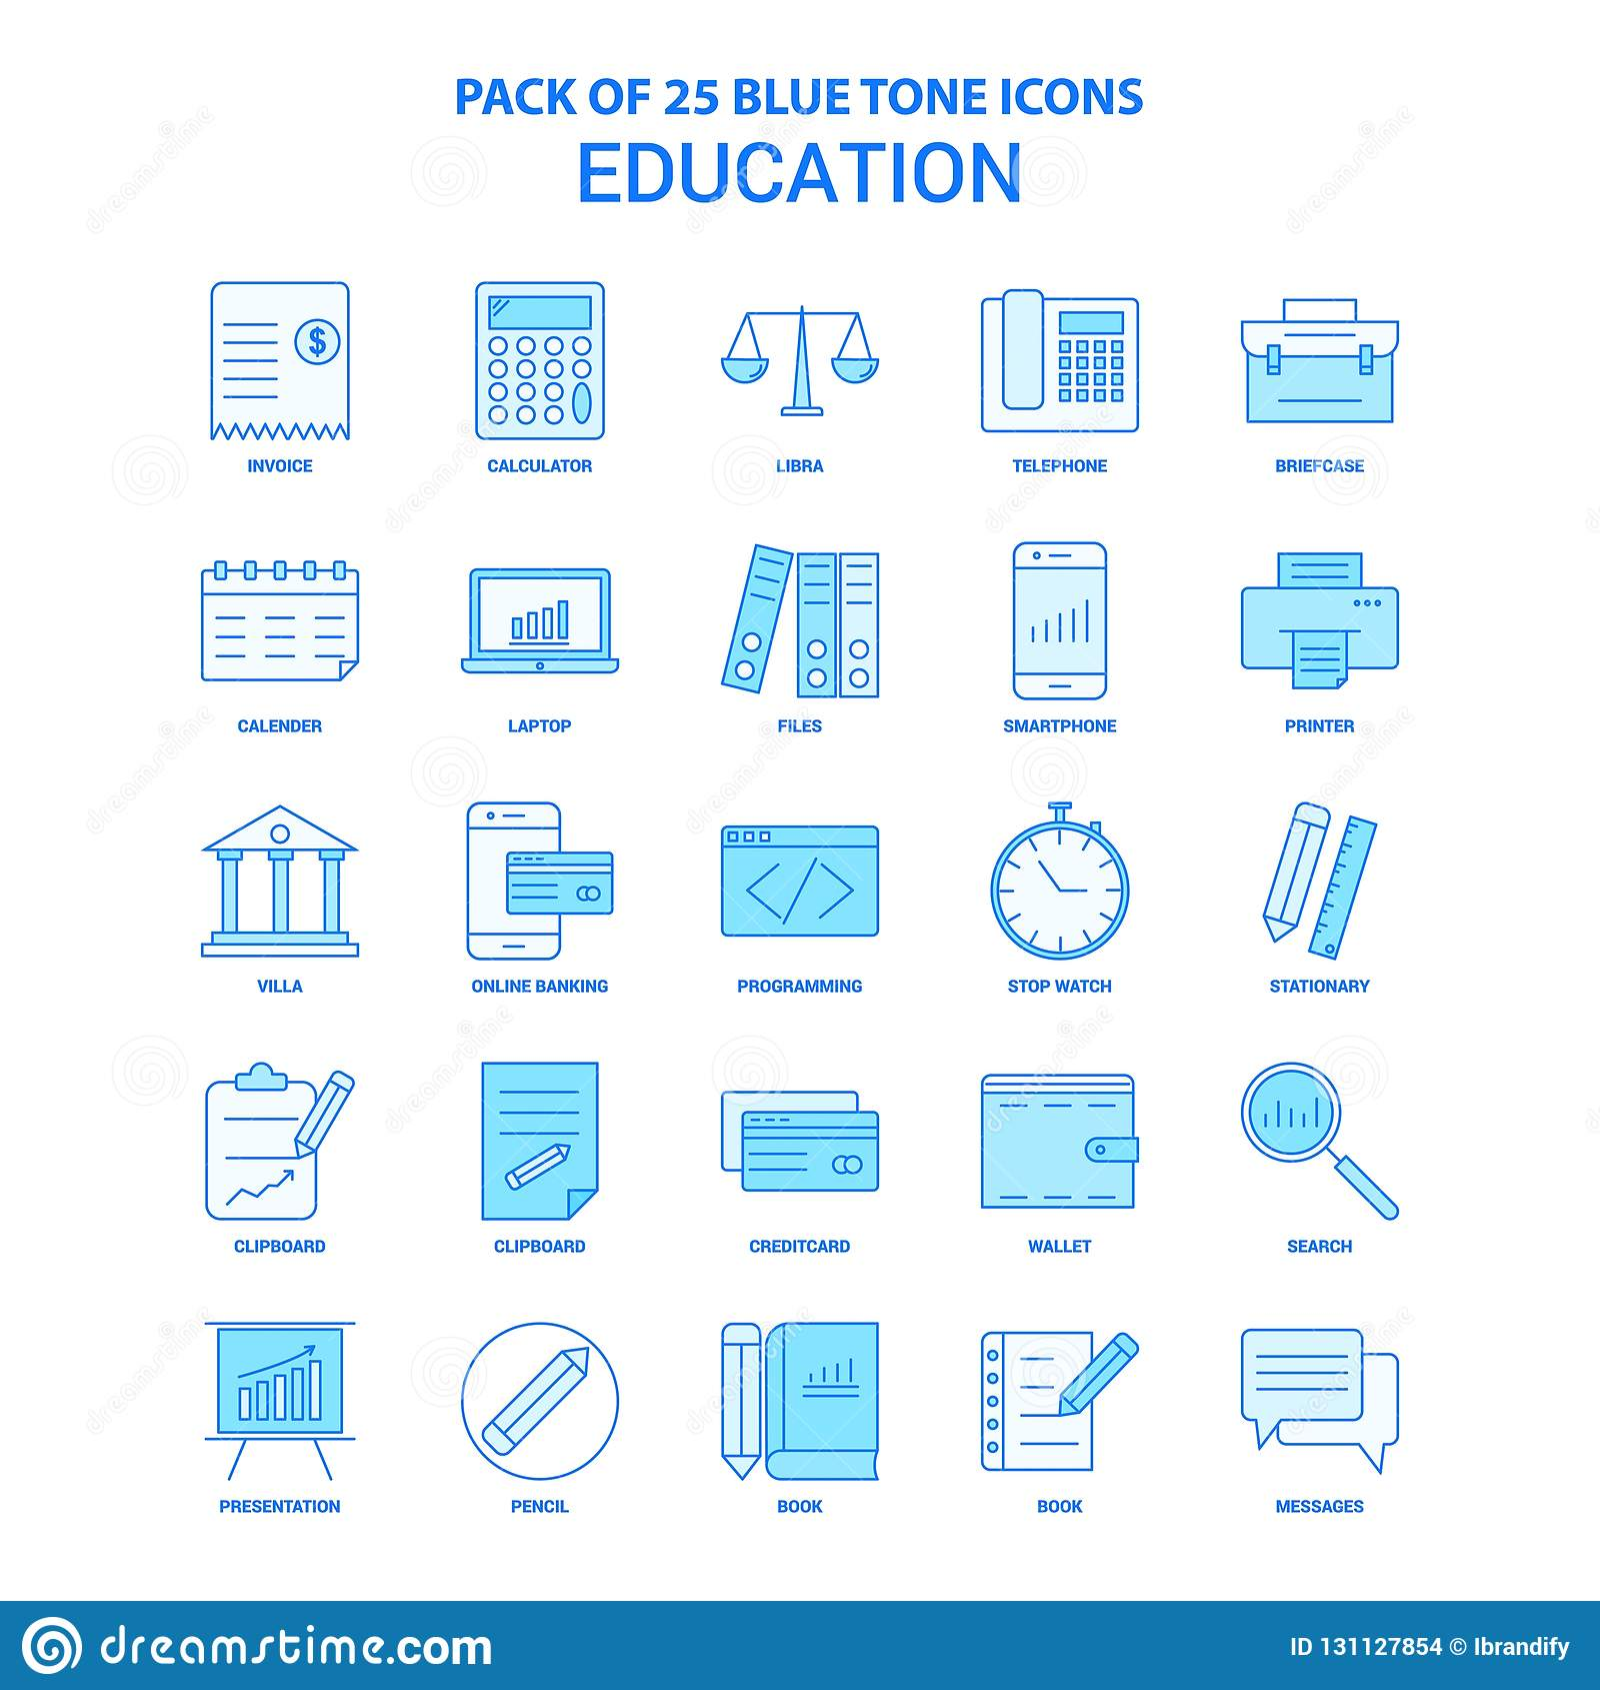 Ausbildung blaue Tone Icon Pack - 25 Ikonen-Sätze